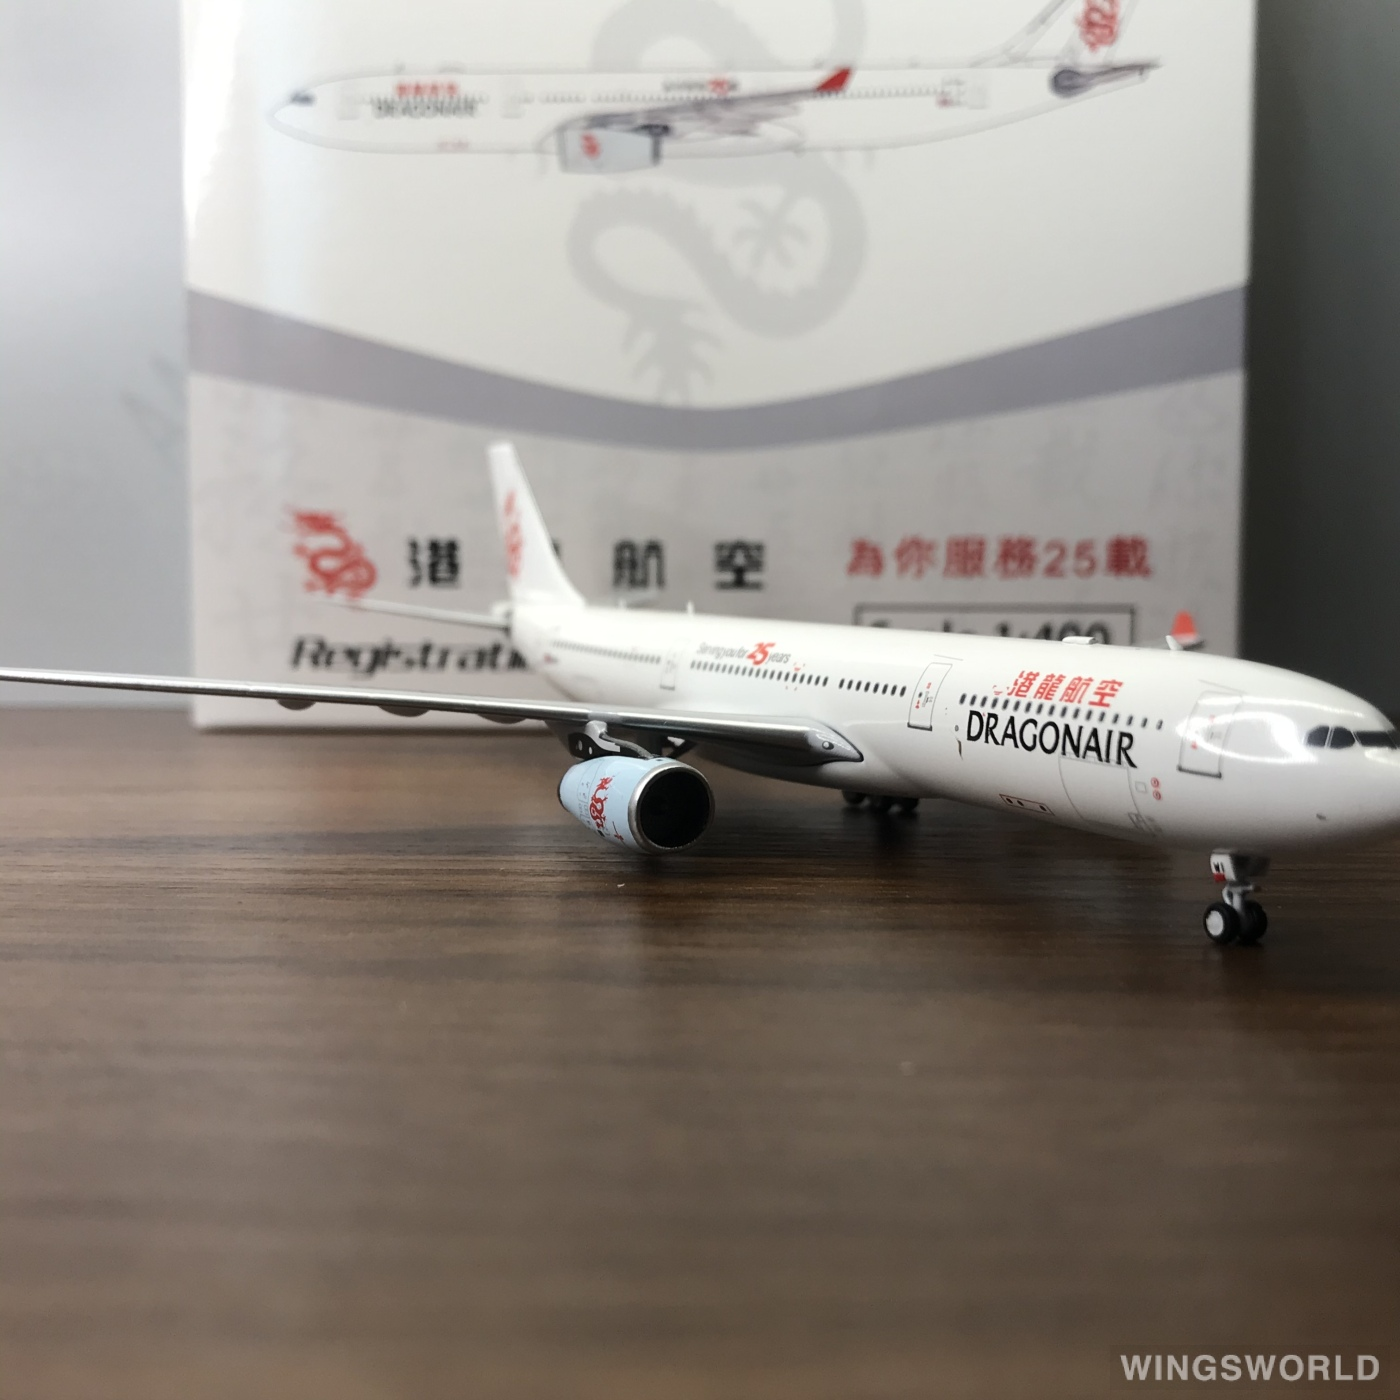 Skywings 1:400 048 Dragonair 港龙航空 Airbus A330-300 B-HWI